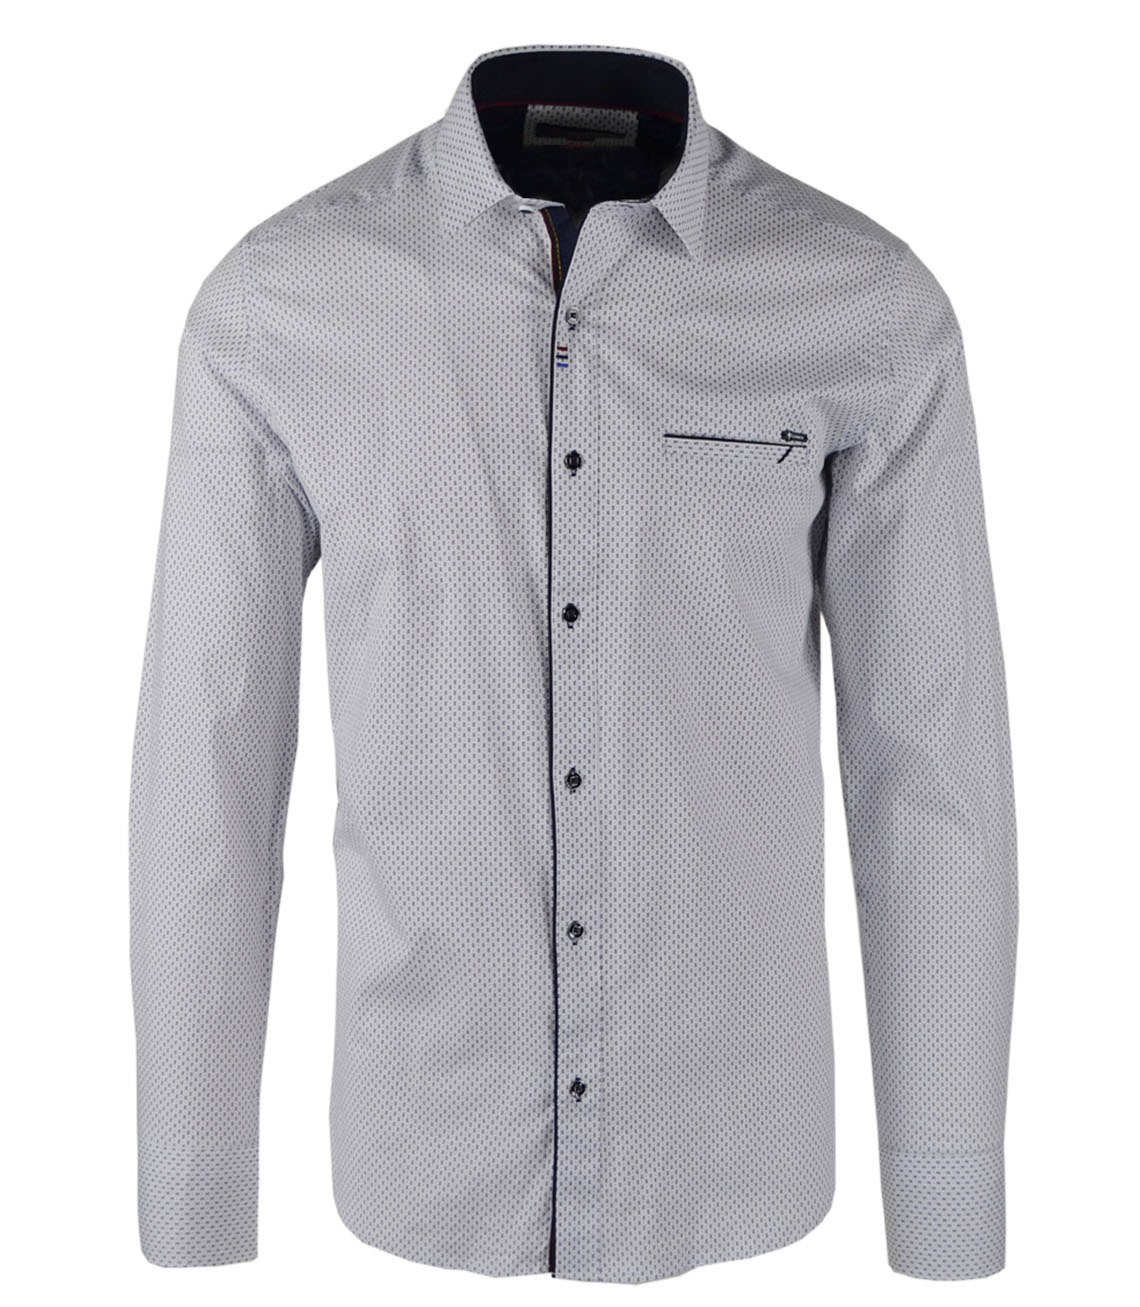 Agrafka Elegancka koszula męska Bawełna SLIM FIT BIAŁY  CX782